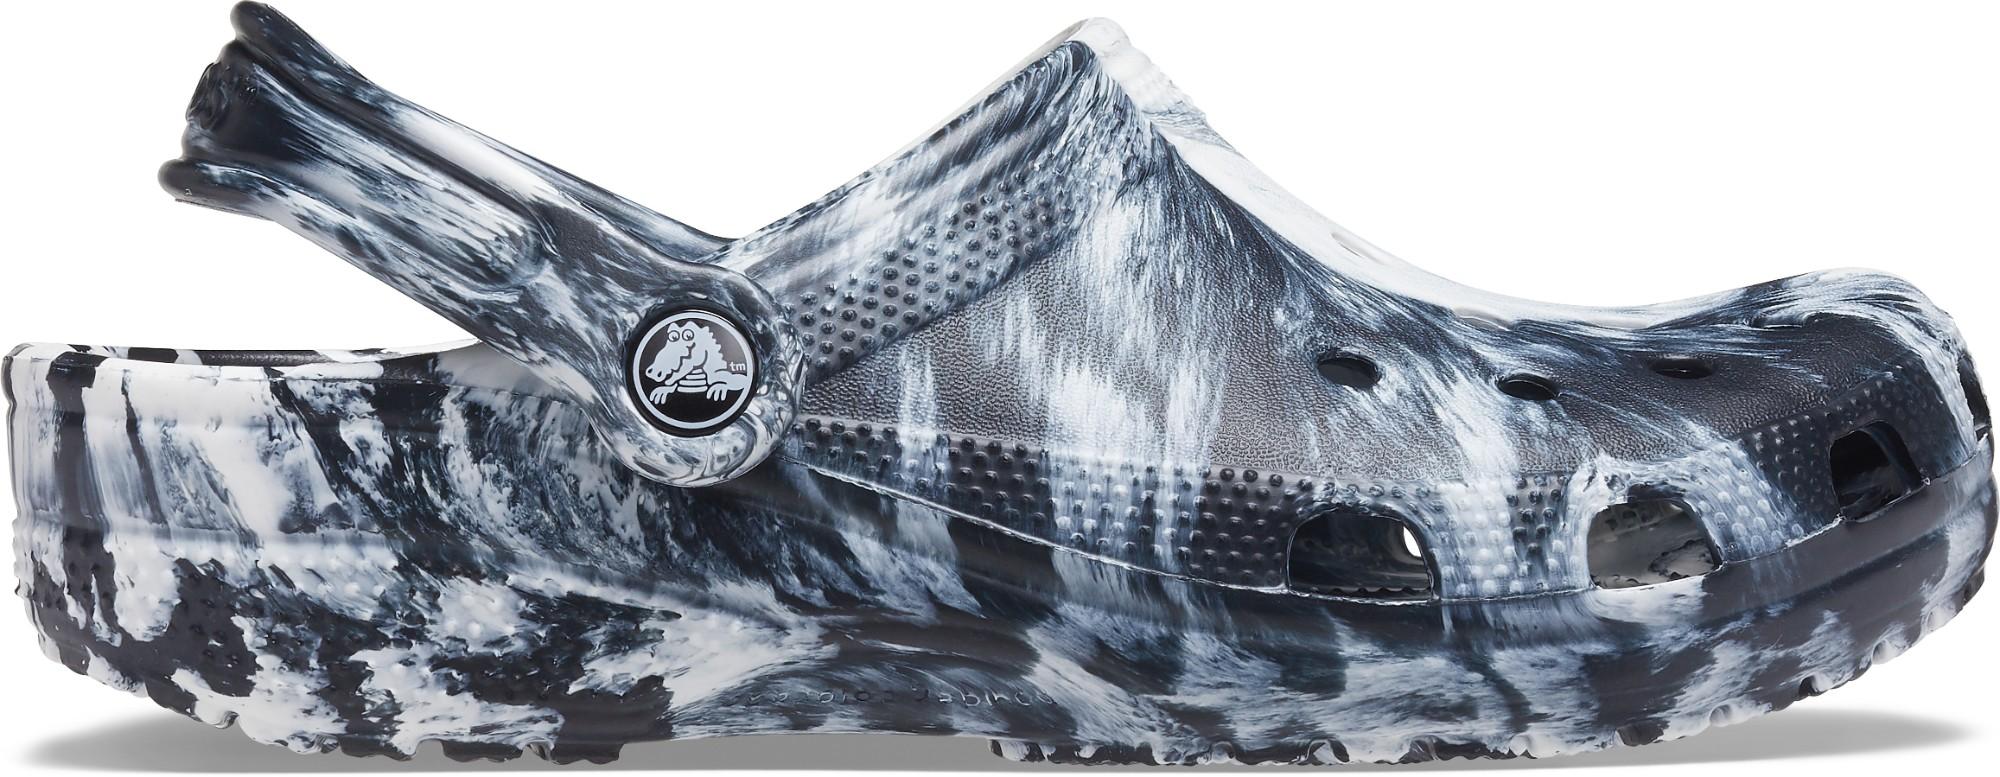 Crocs™ Classic Marbled Clog White/Black 36,5